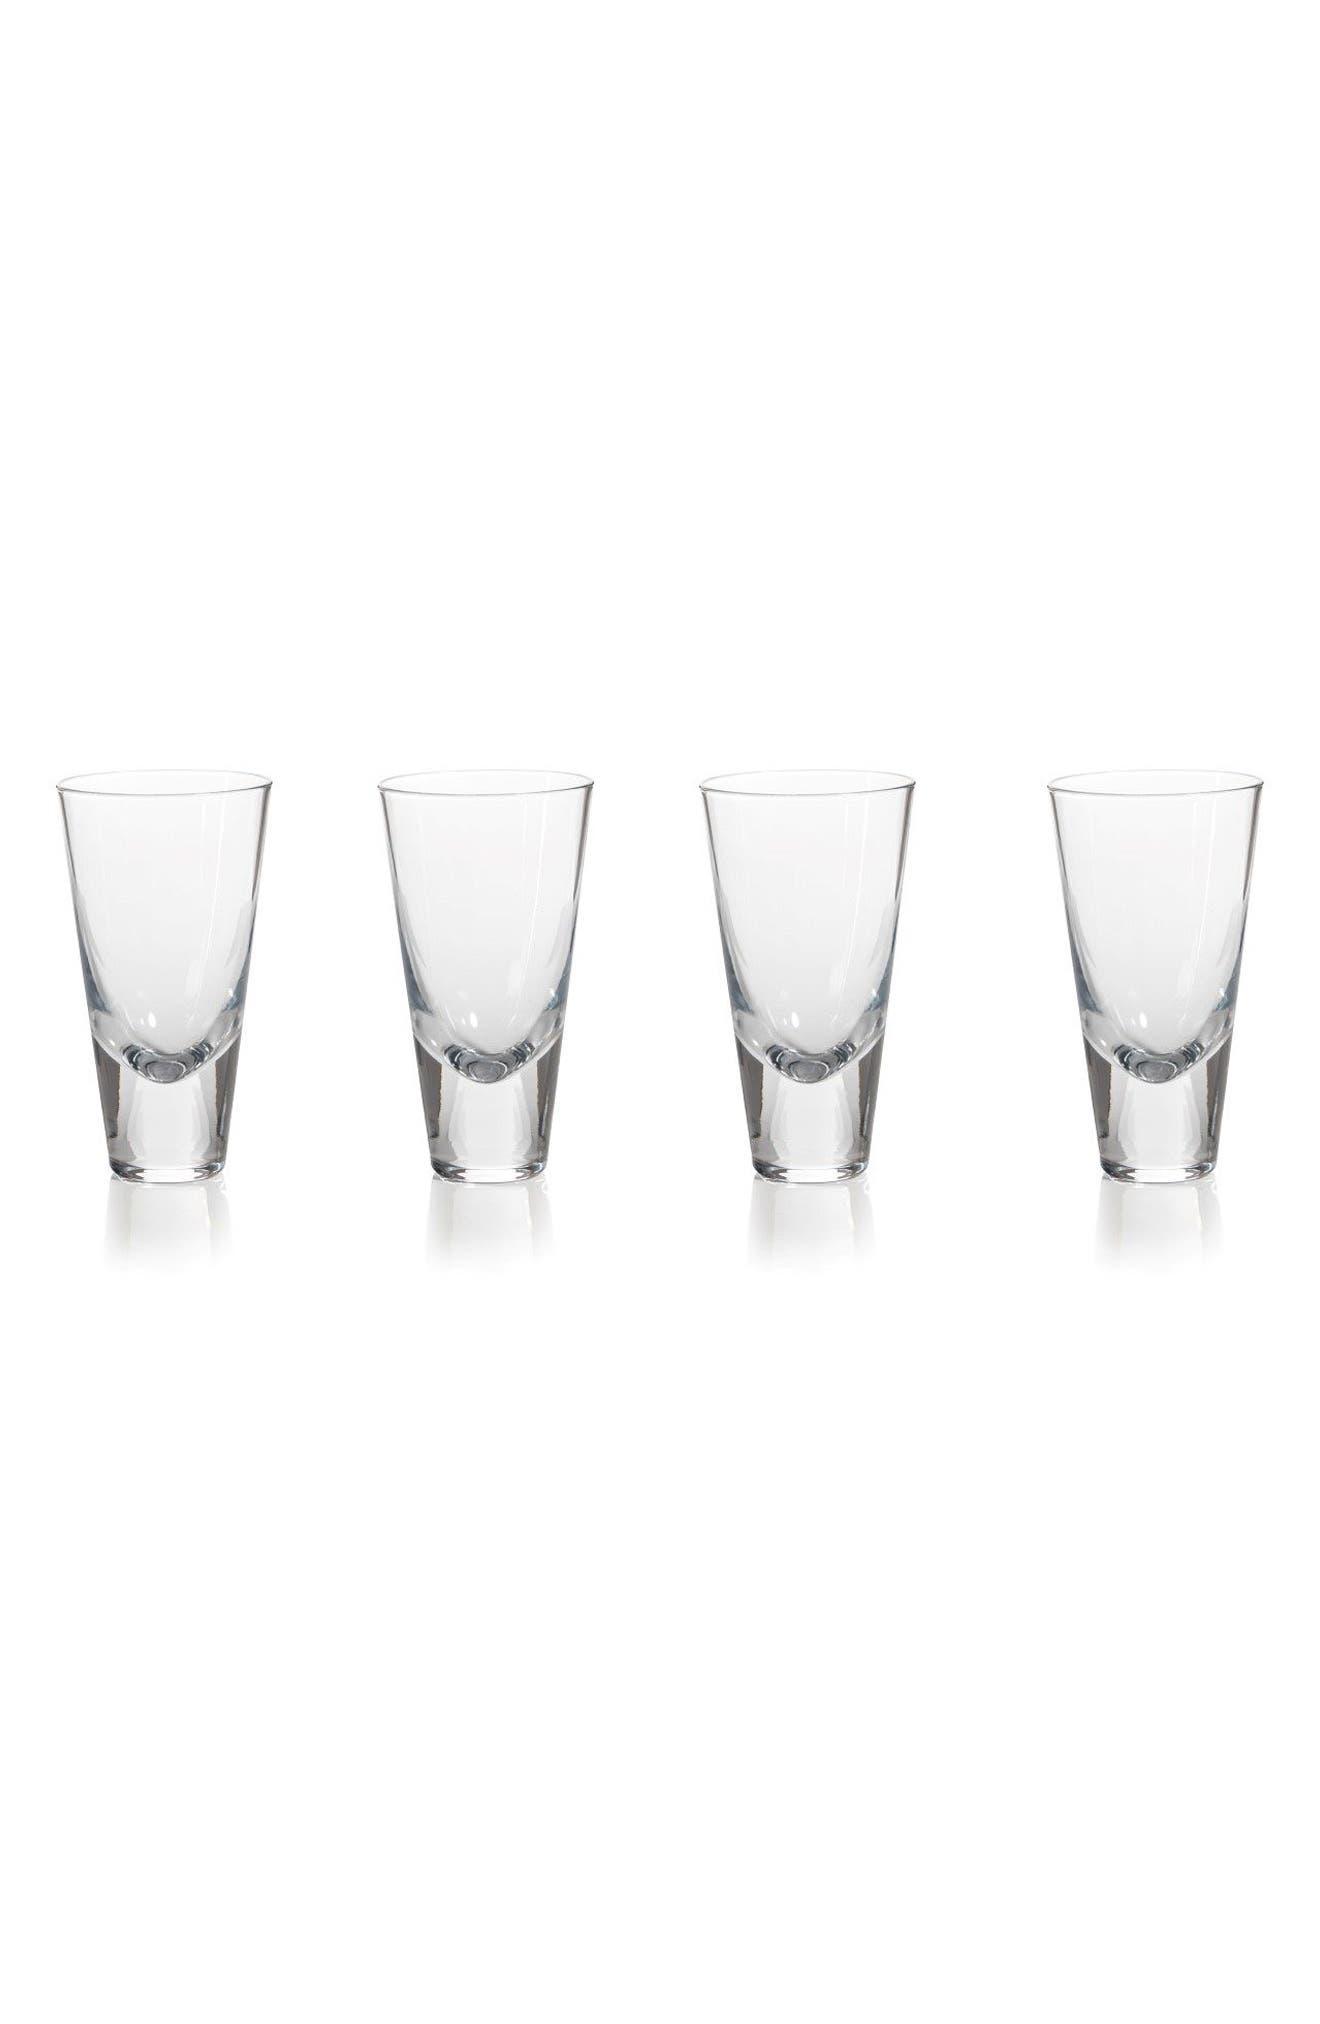 Main Image - Zodax Anatole Set of 4 Drinking Glasses